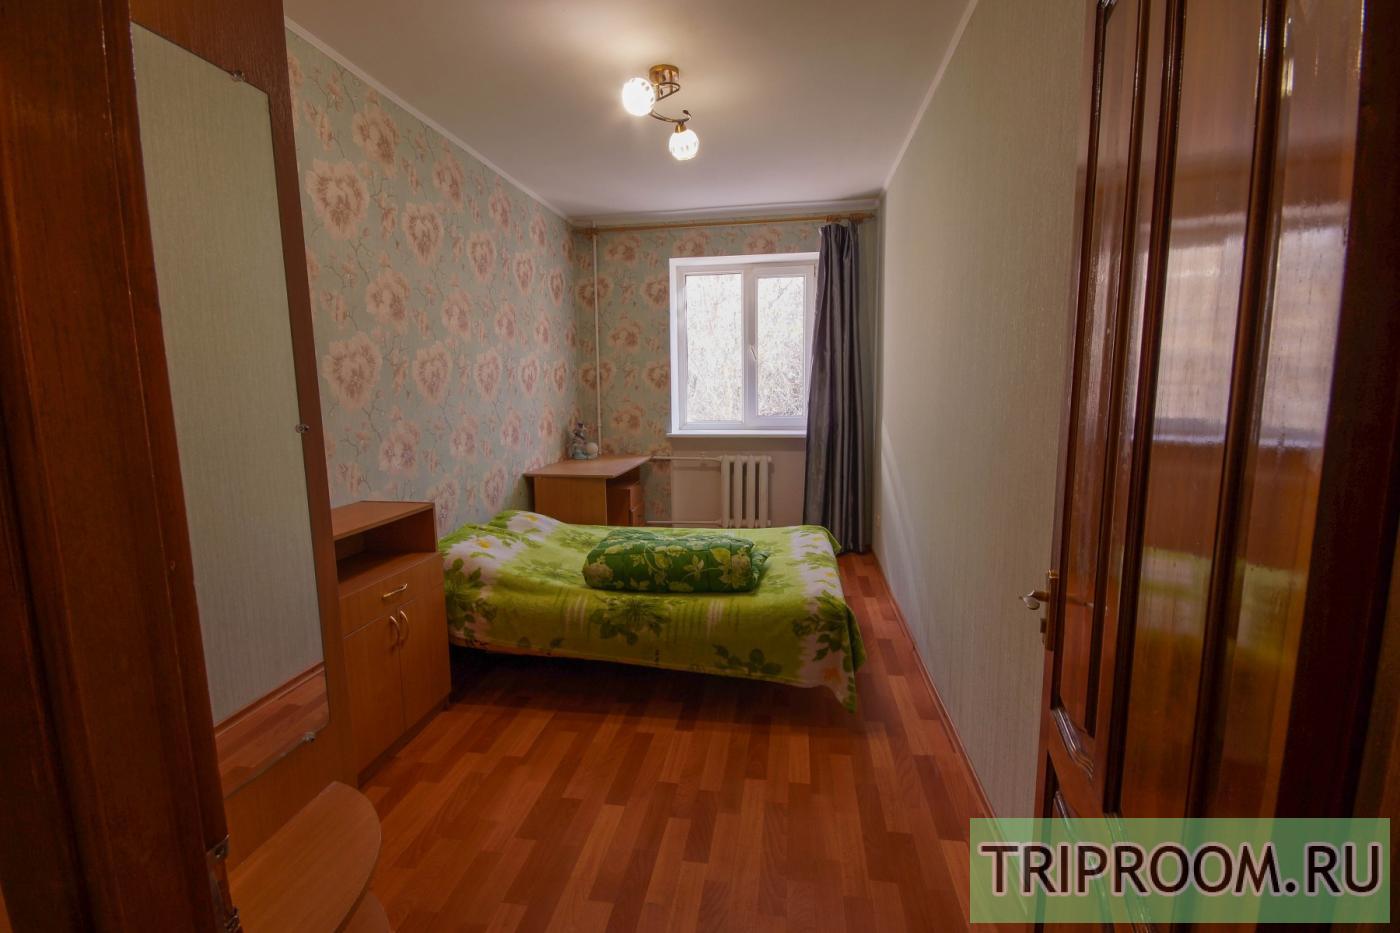 3-комнатная квартира посуточно (вариант № 19470), ул. Спера улица, фото № 7